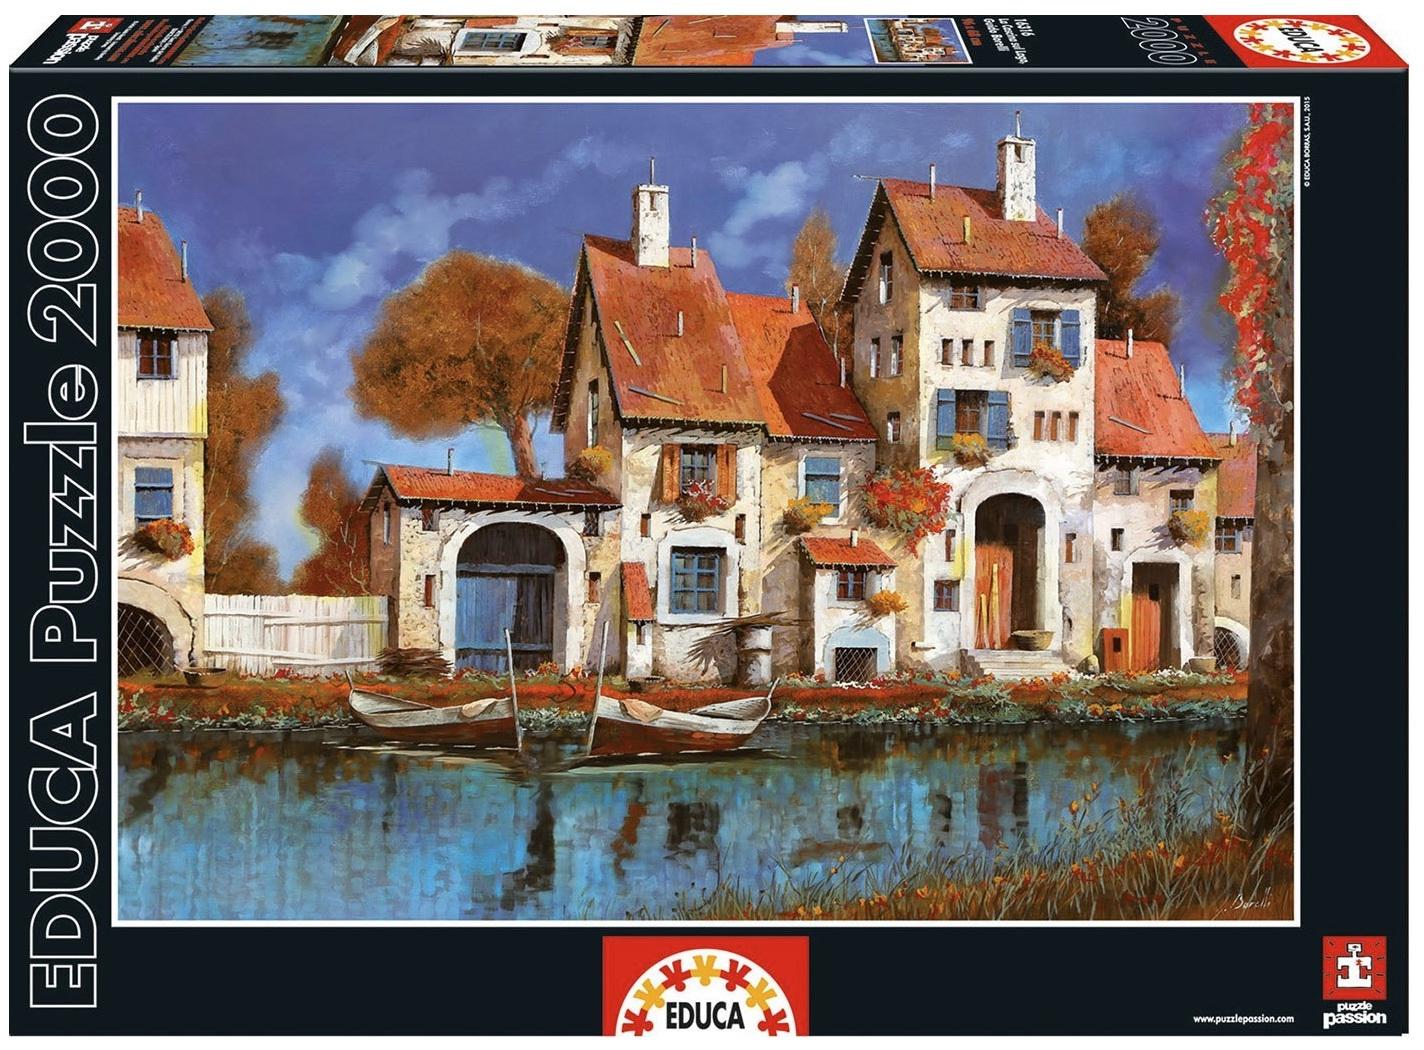 61cd9539c8656 Educa 2000 Piece Jigsaw Puzzle La Cascina Sul Lago - PuzzlesNZ